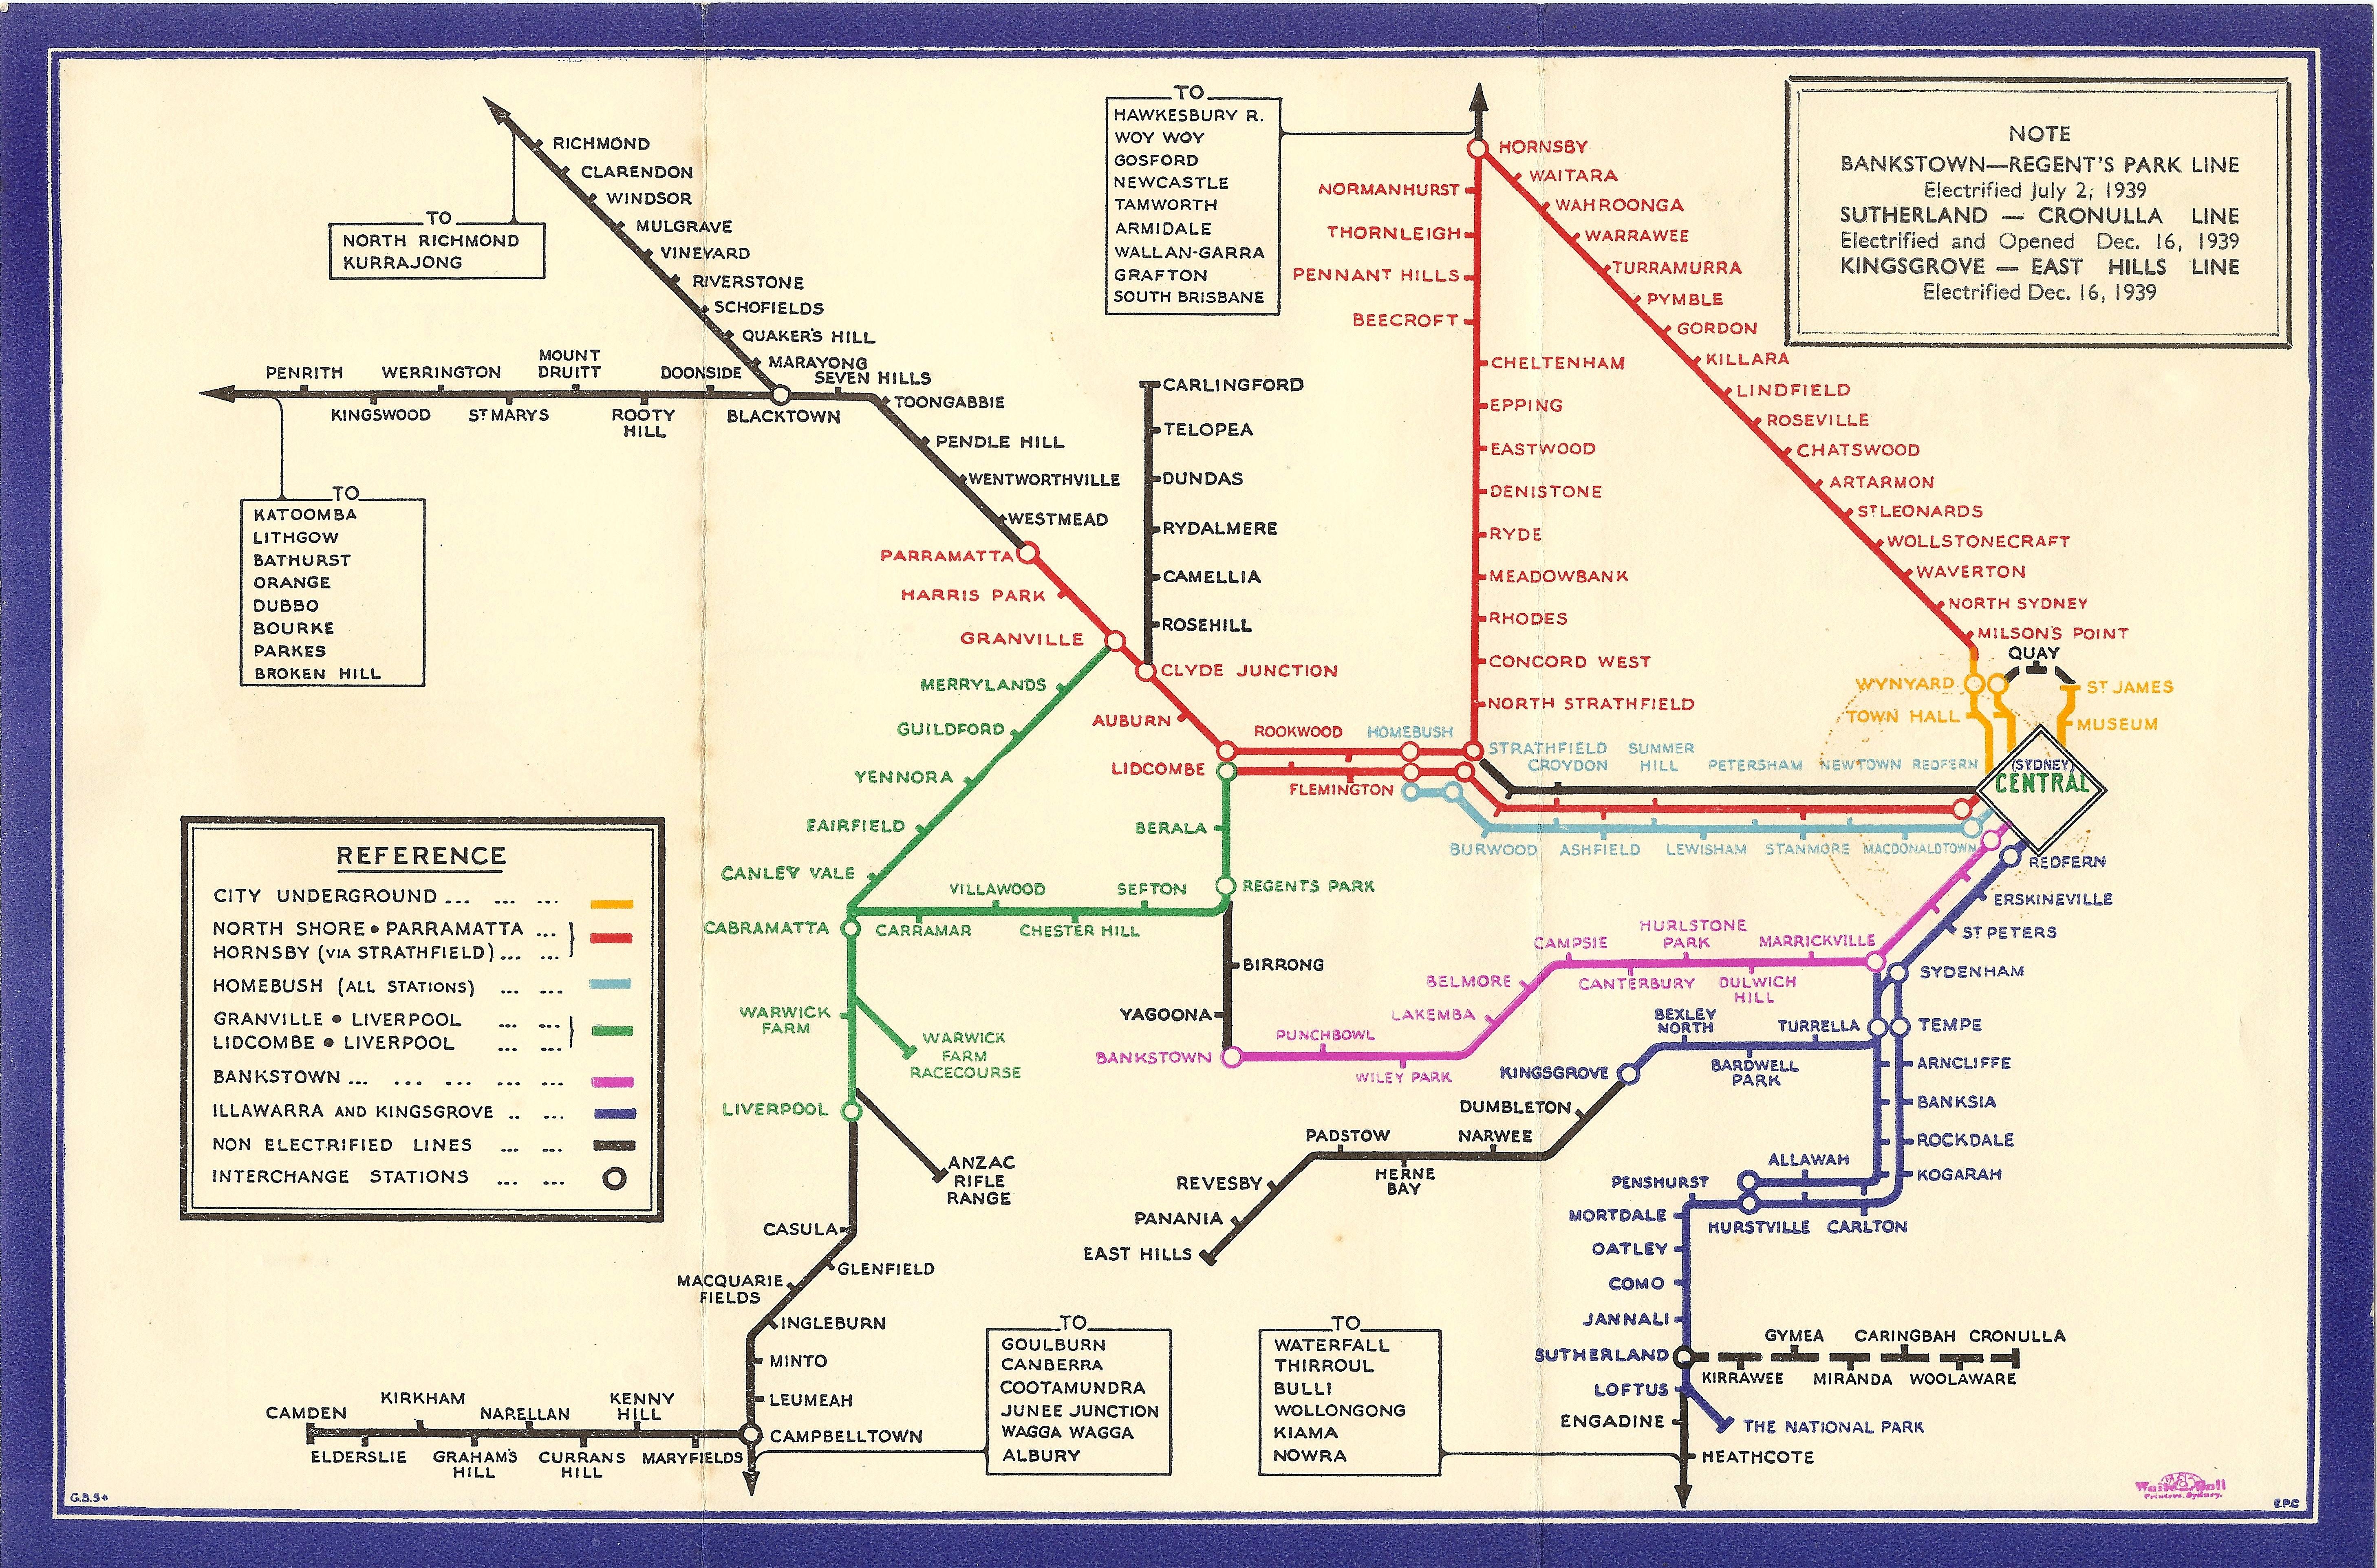 perth rail map australia sydney - photo#2